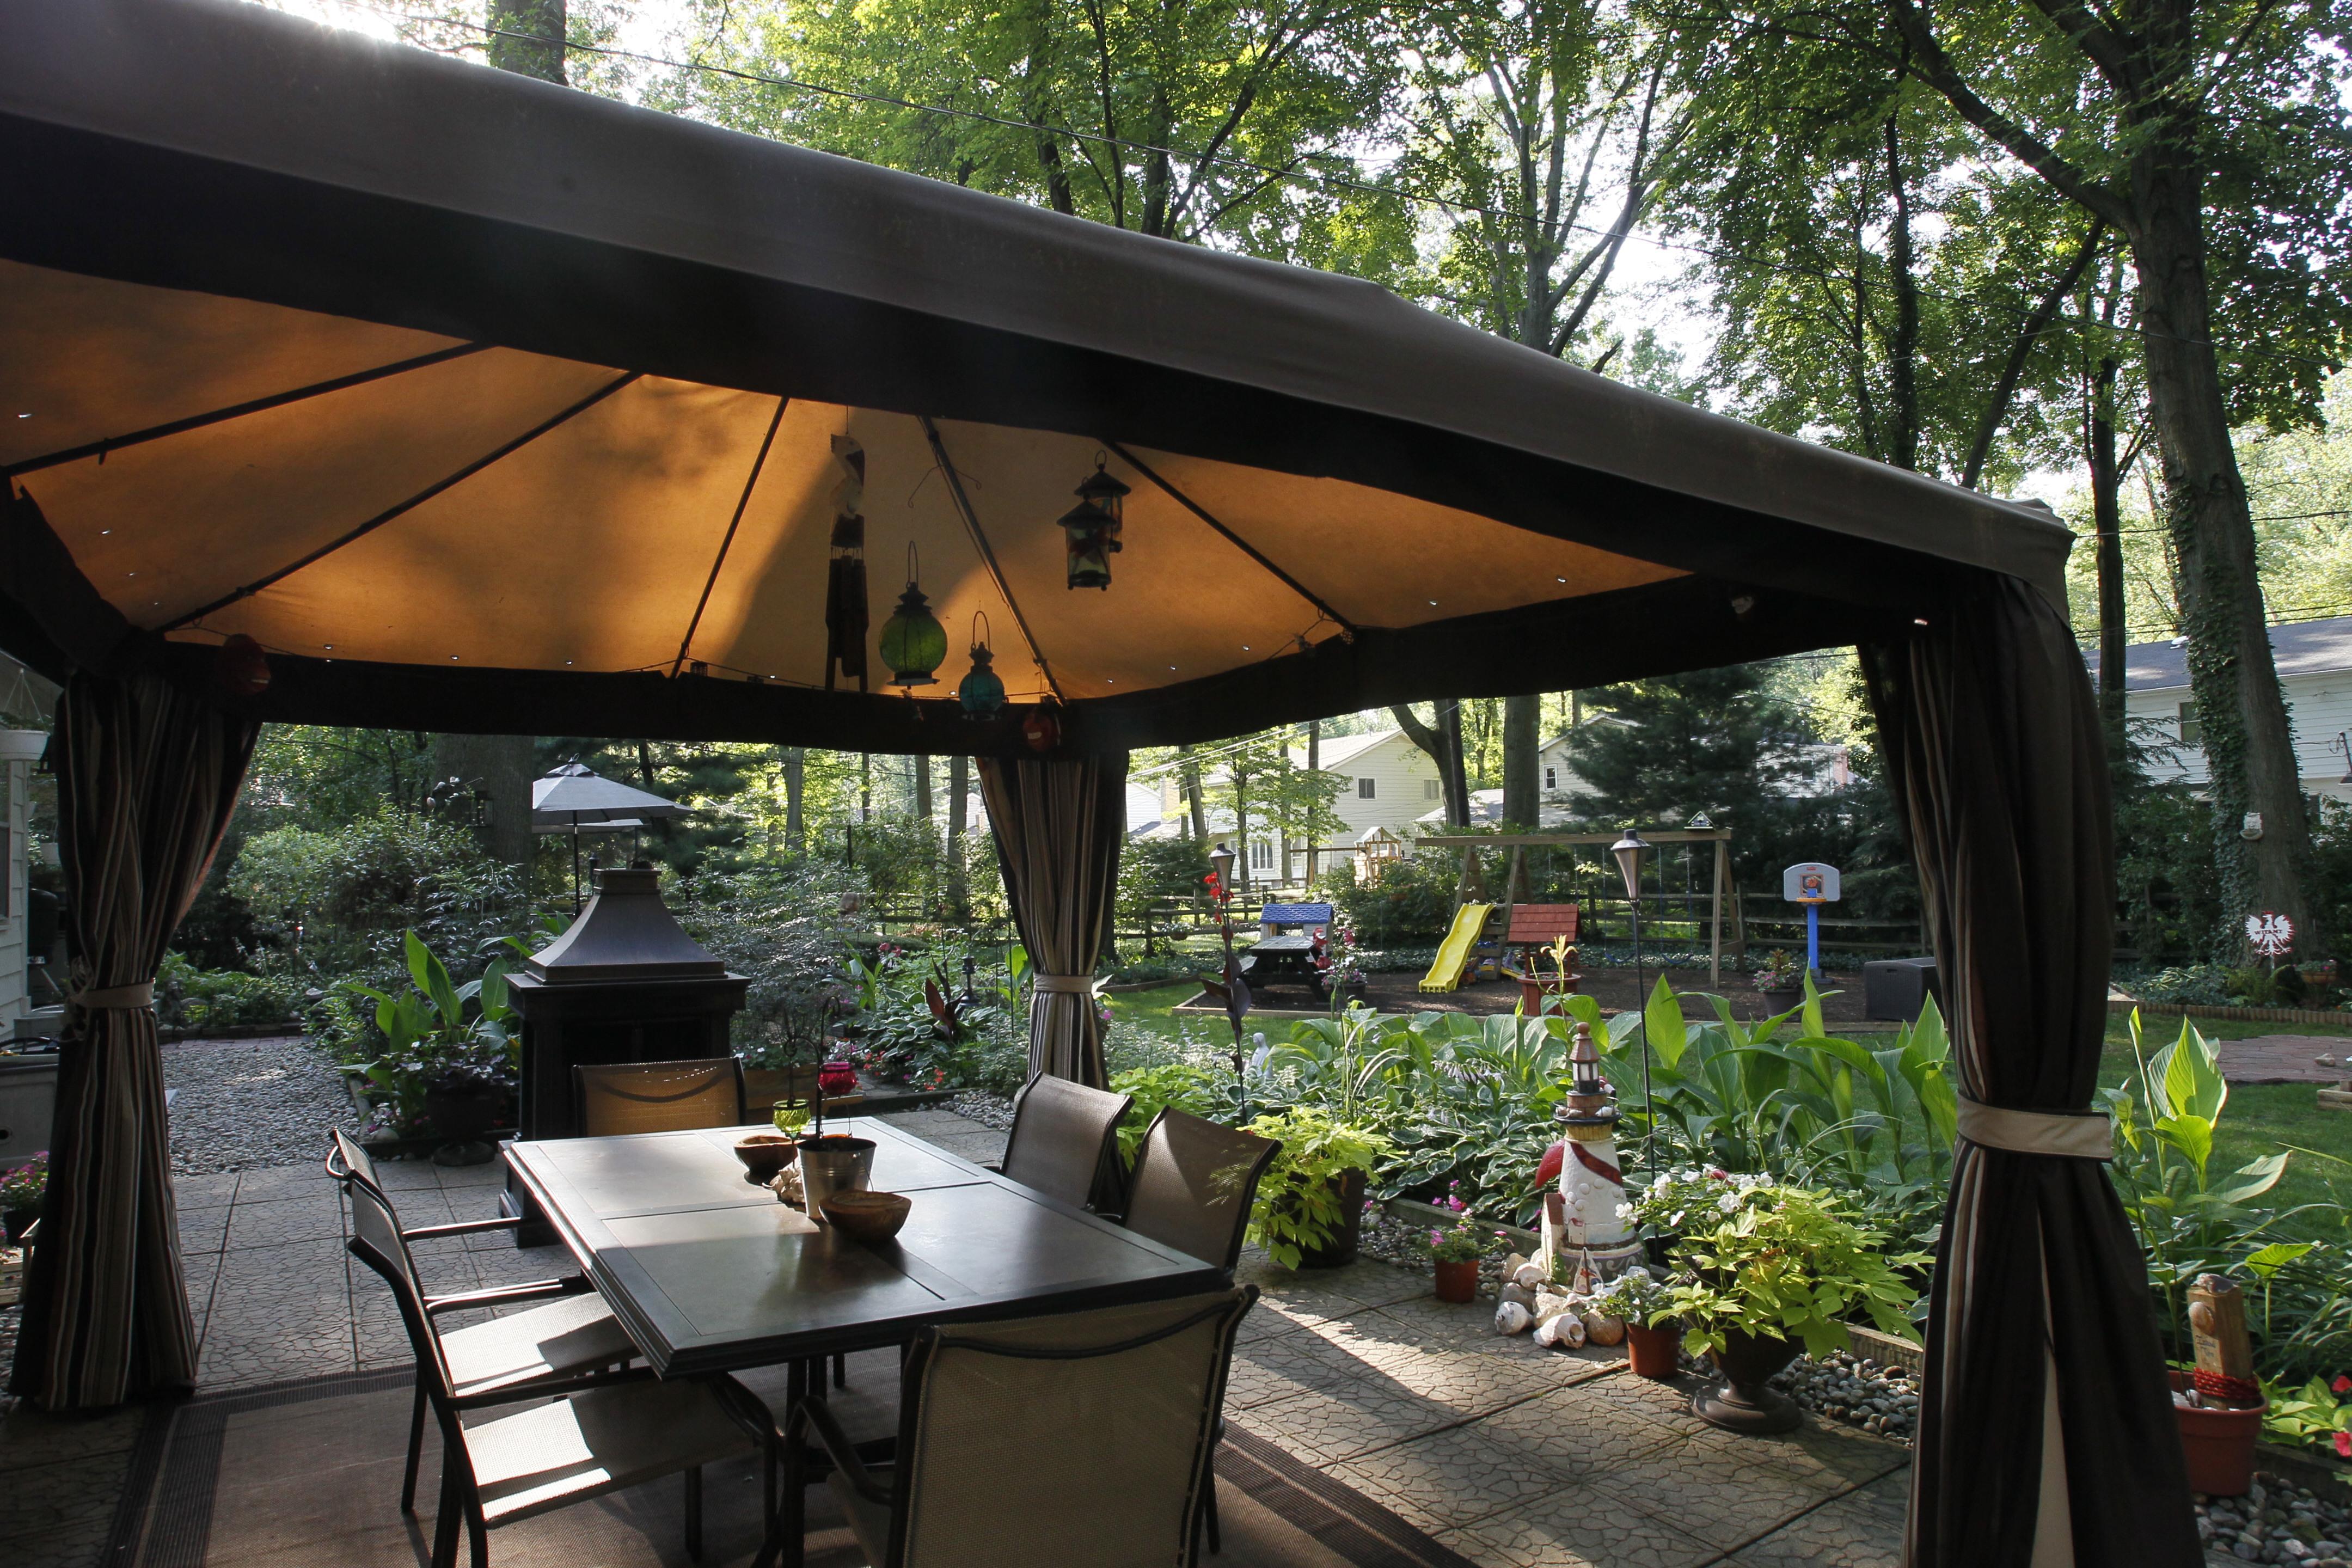 Luke D. Mazur: Hard work in garden pays off - The Blade on Landscape Your Backyard id=78982